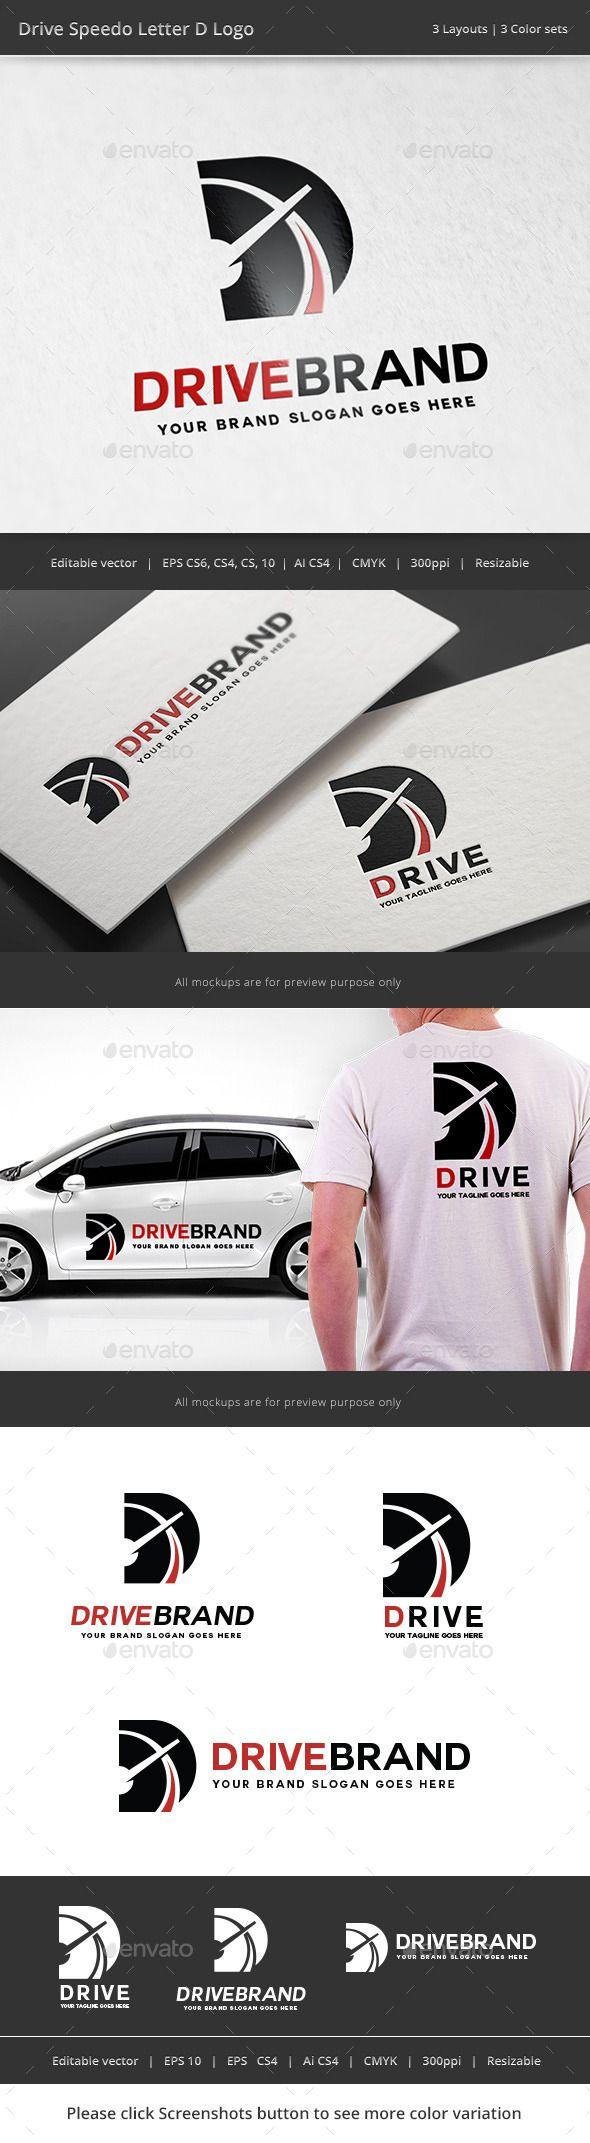 Drive Letter D Logo — Vector EPS #velocilty #brand • Available here → https://graphicriver.net/item/drive-letter-d-logo/11322178?ref=pxcr